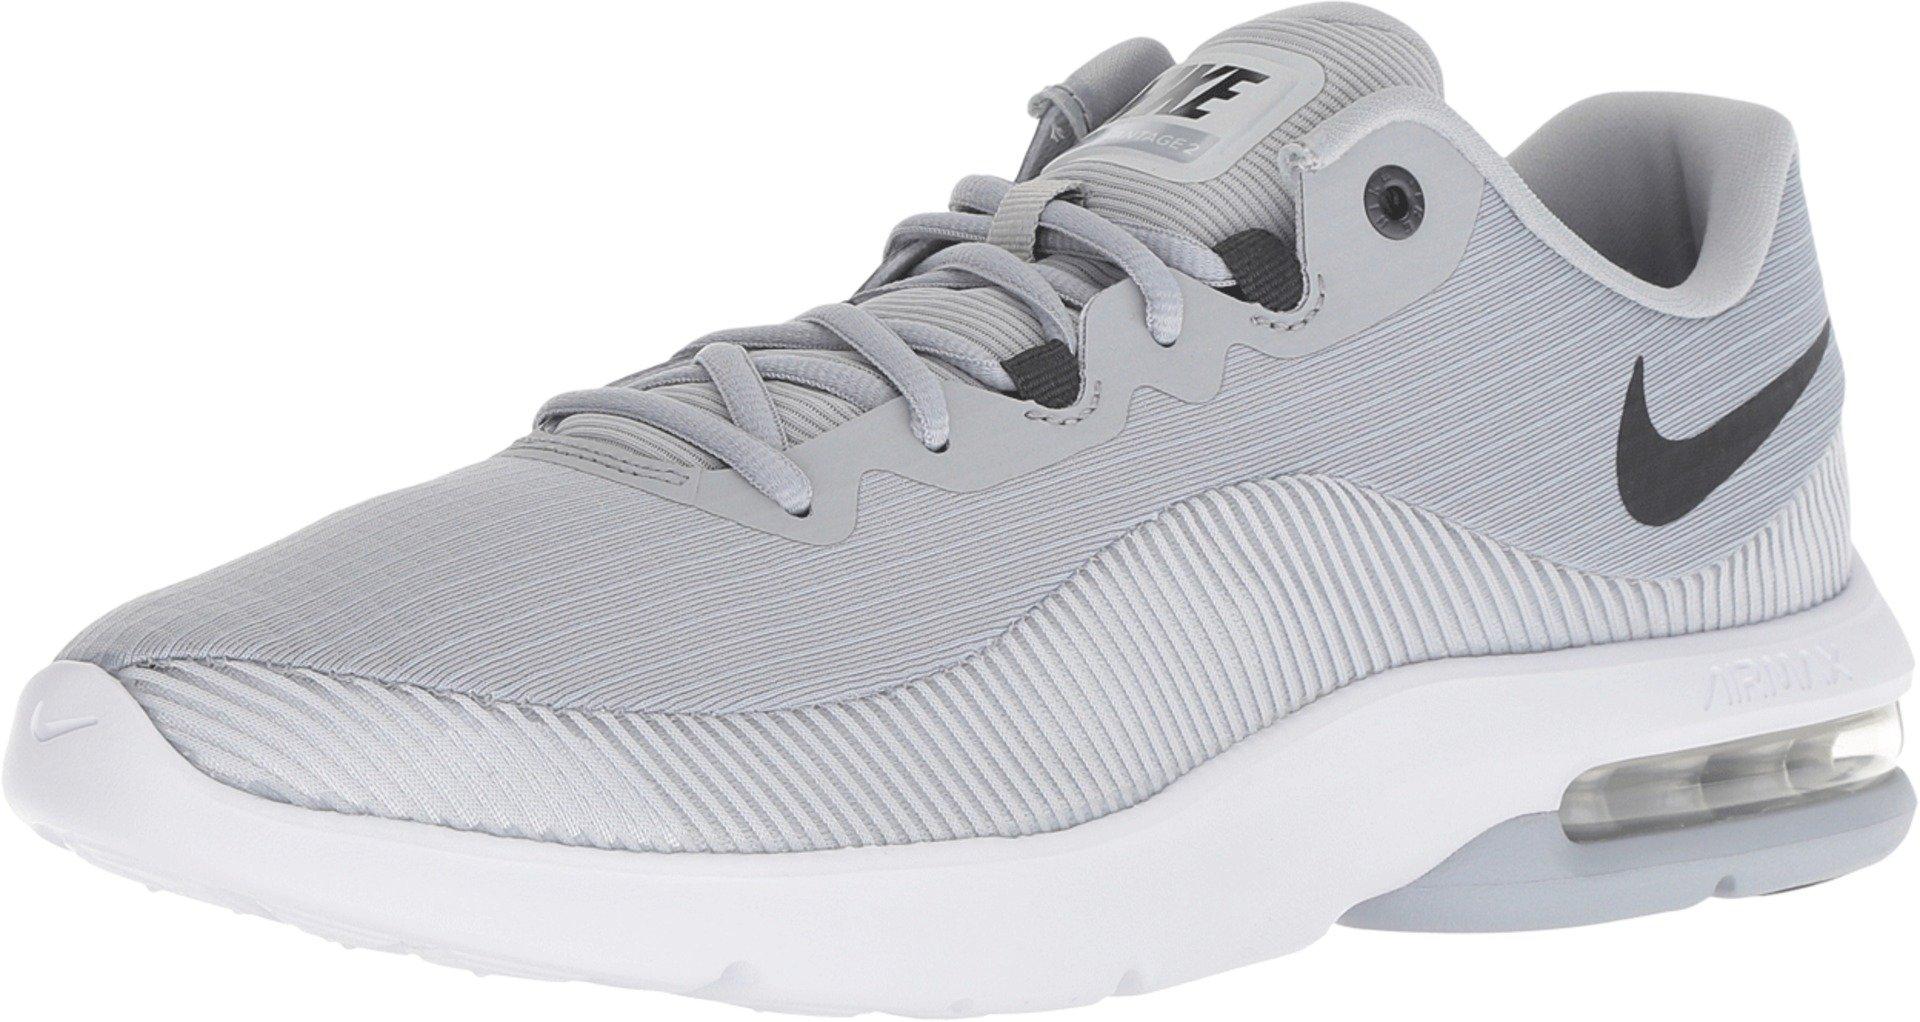 Nike Men's Air Max Advantage 2 Running Shoe, Wolf GreyAnthracite Pure Platinum White, 10